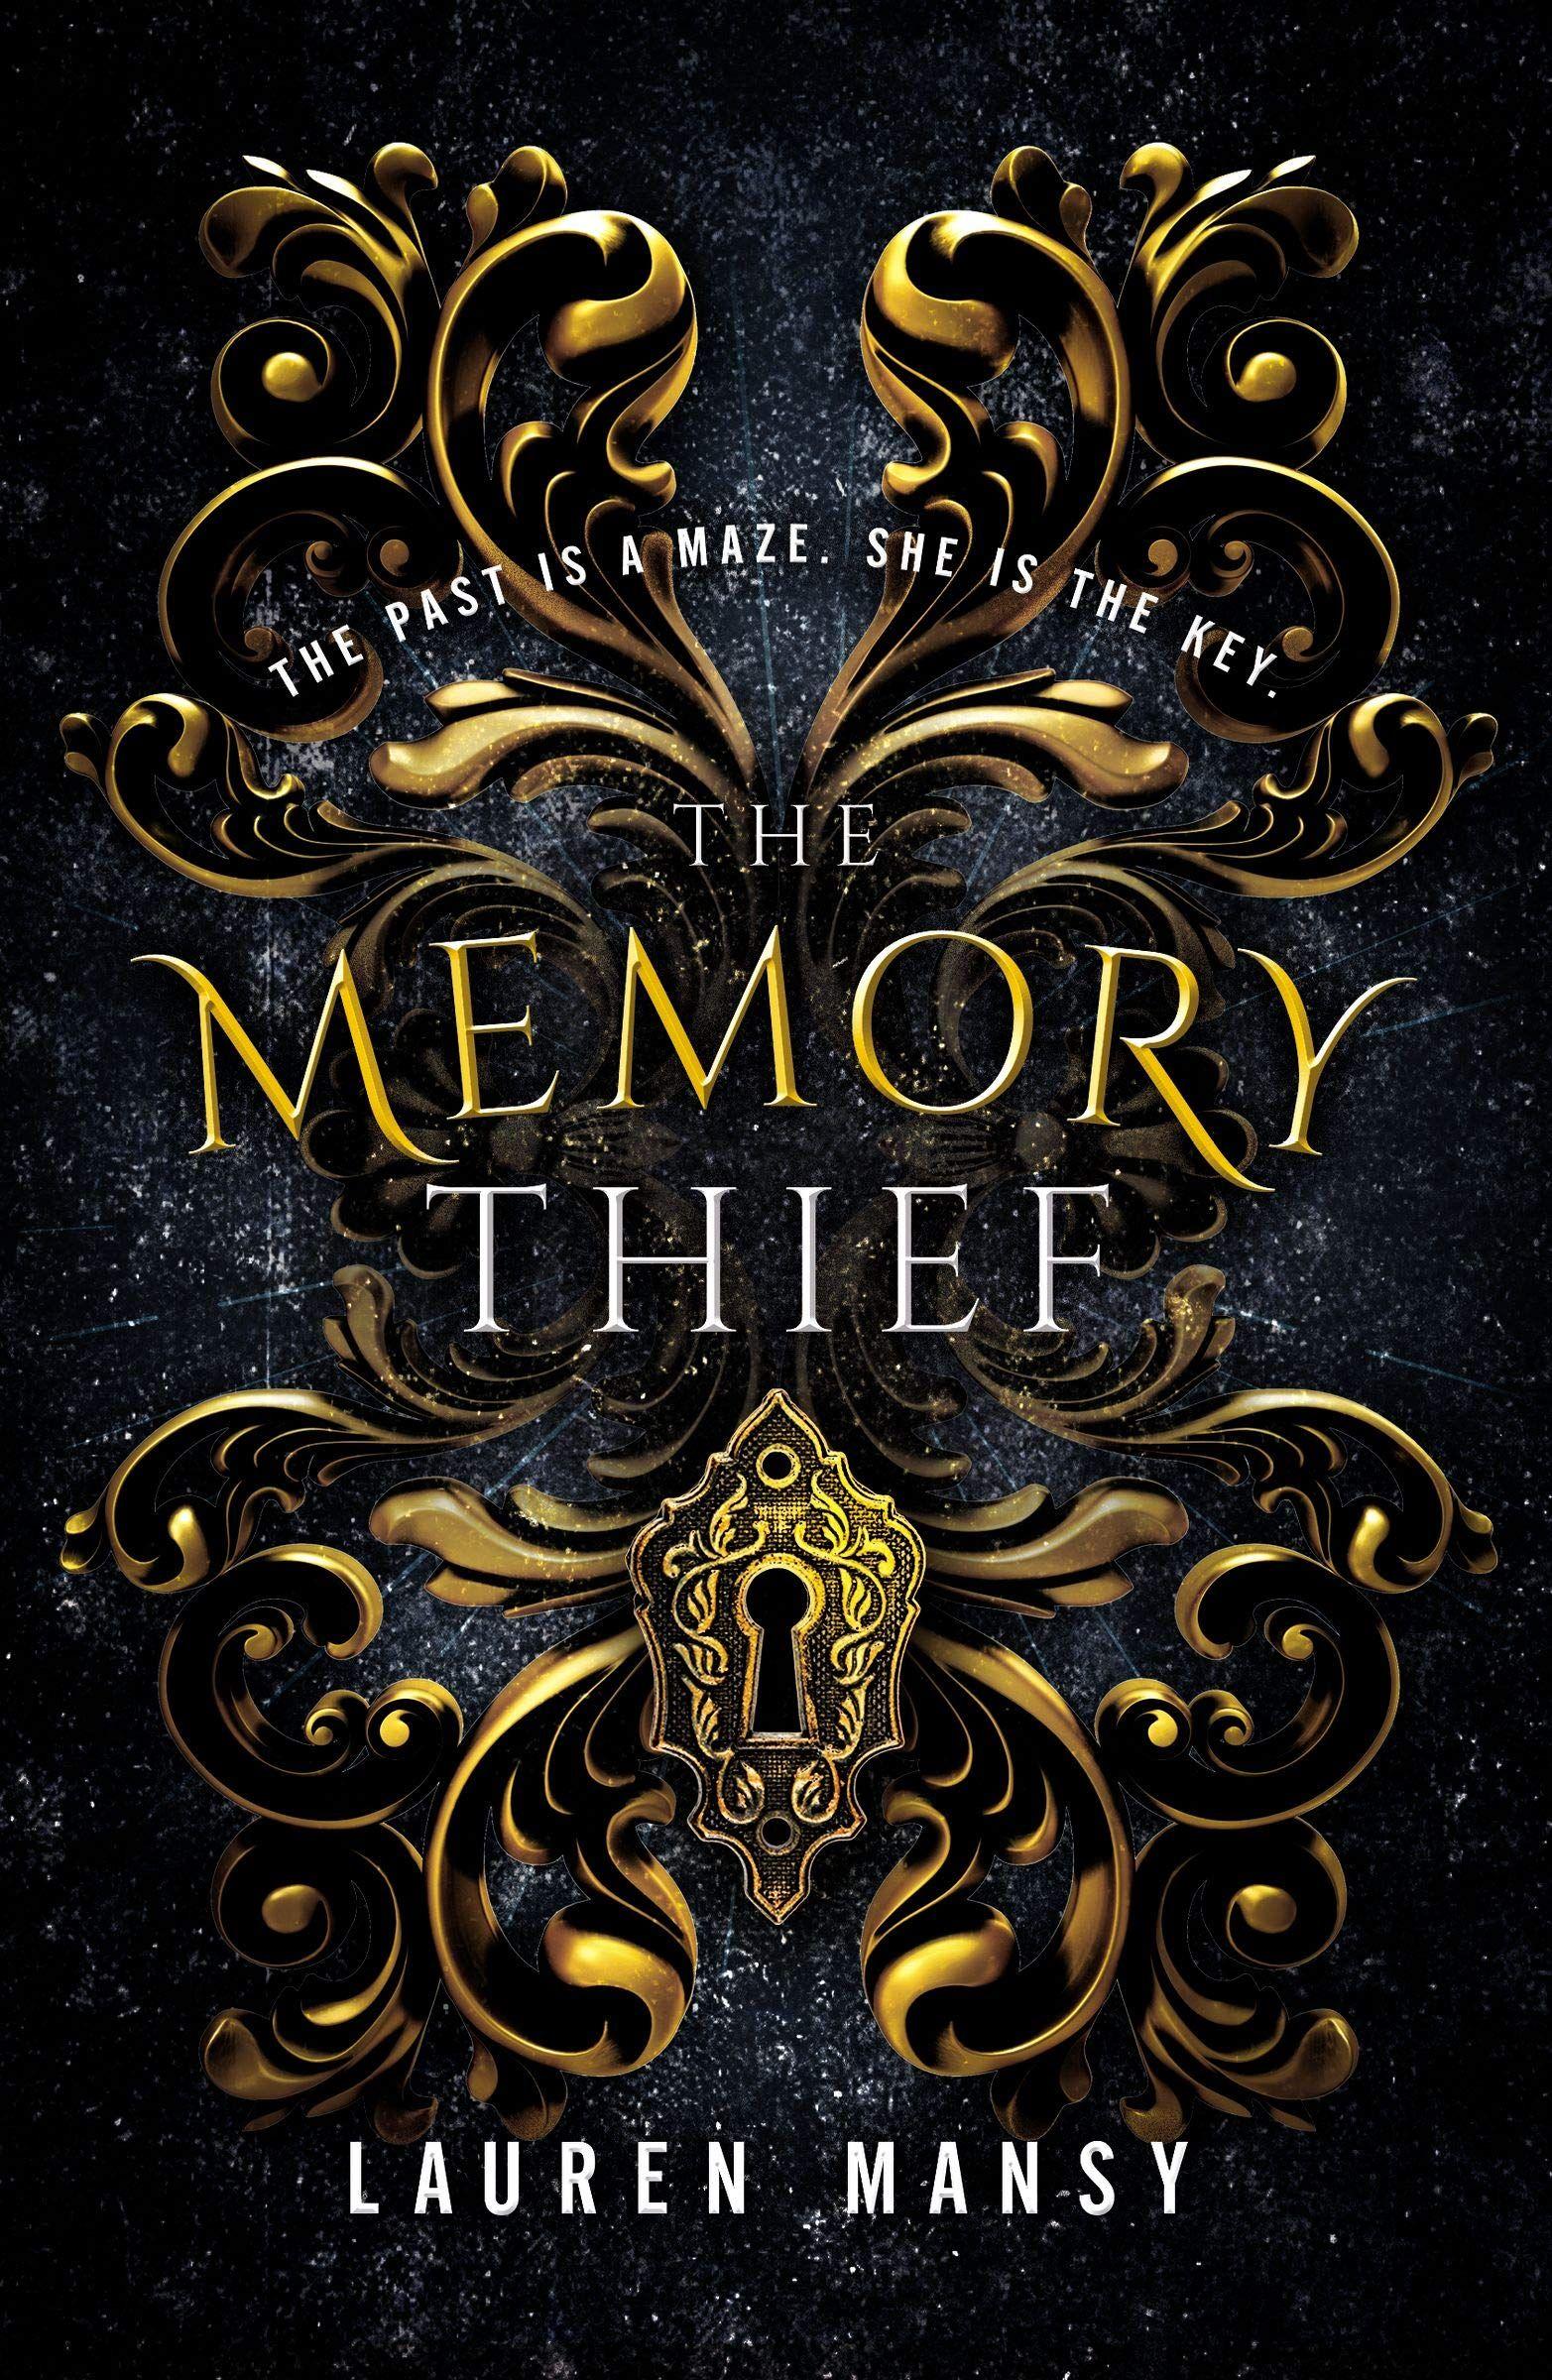 Pdf Download The Memory Thief By Lauren Mansy Ya Fantasy Books Fantasy Books Ya Books